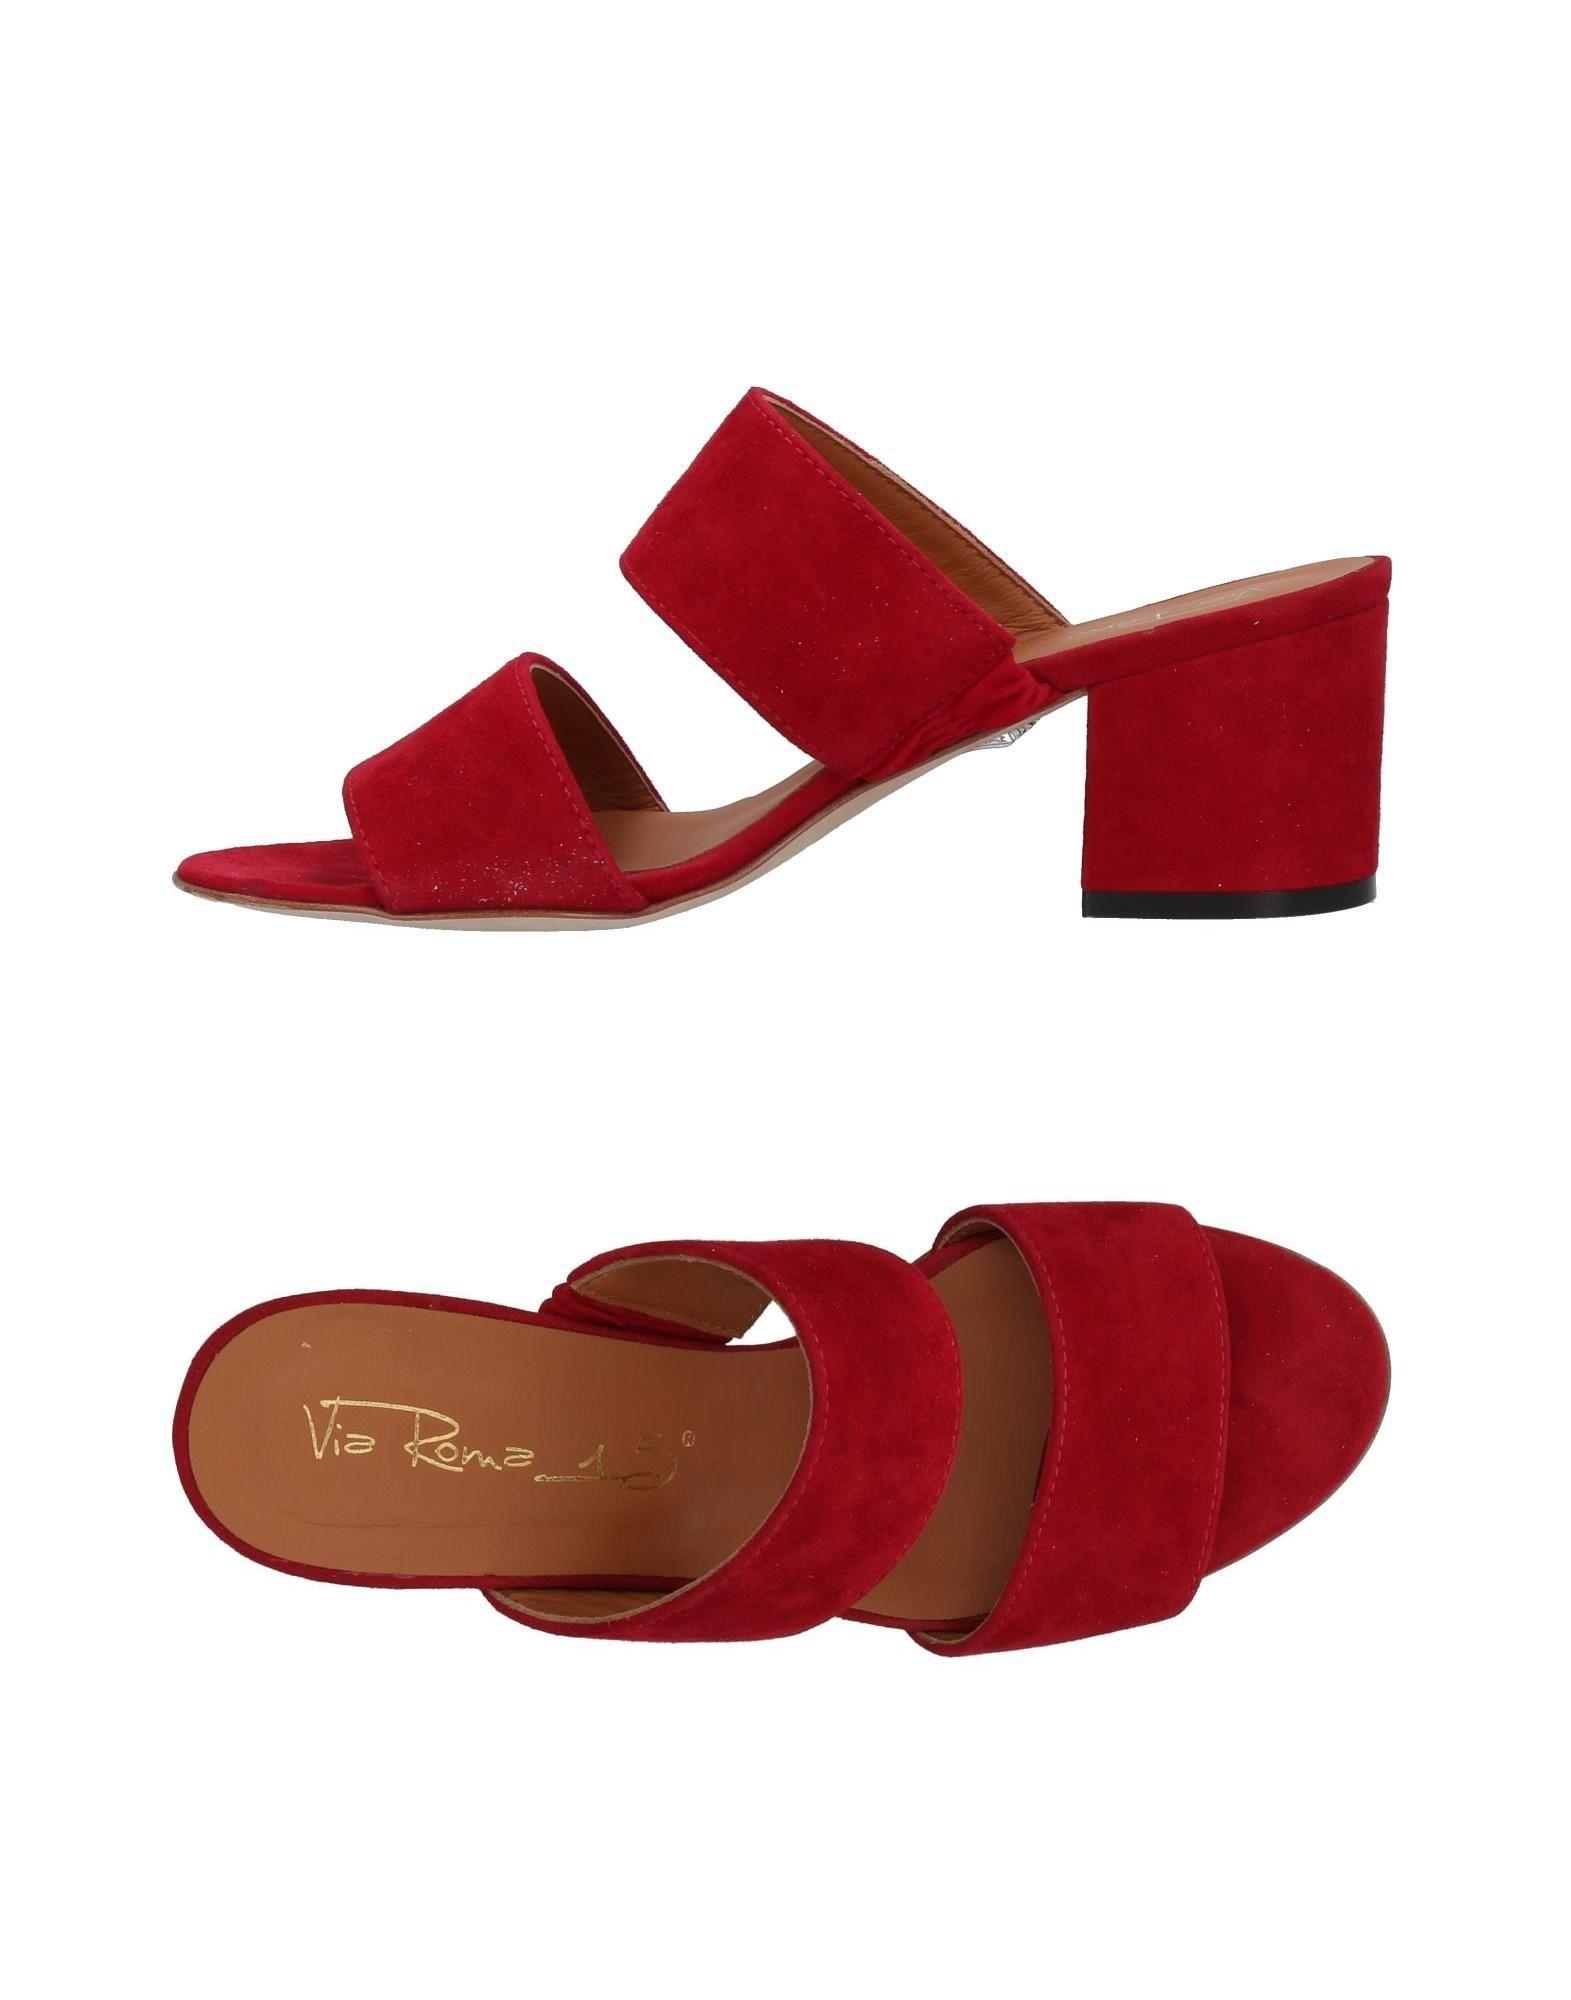 VIA ROMA 15 Сандалии via marte сандалии